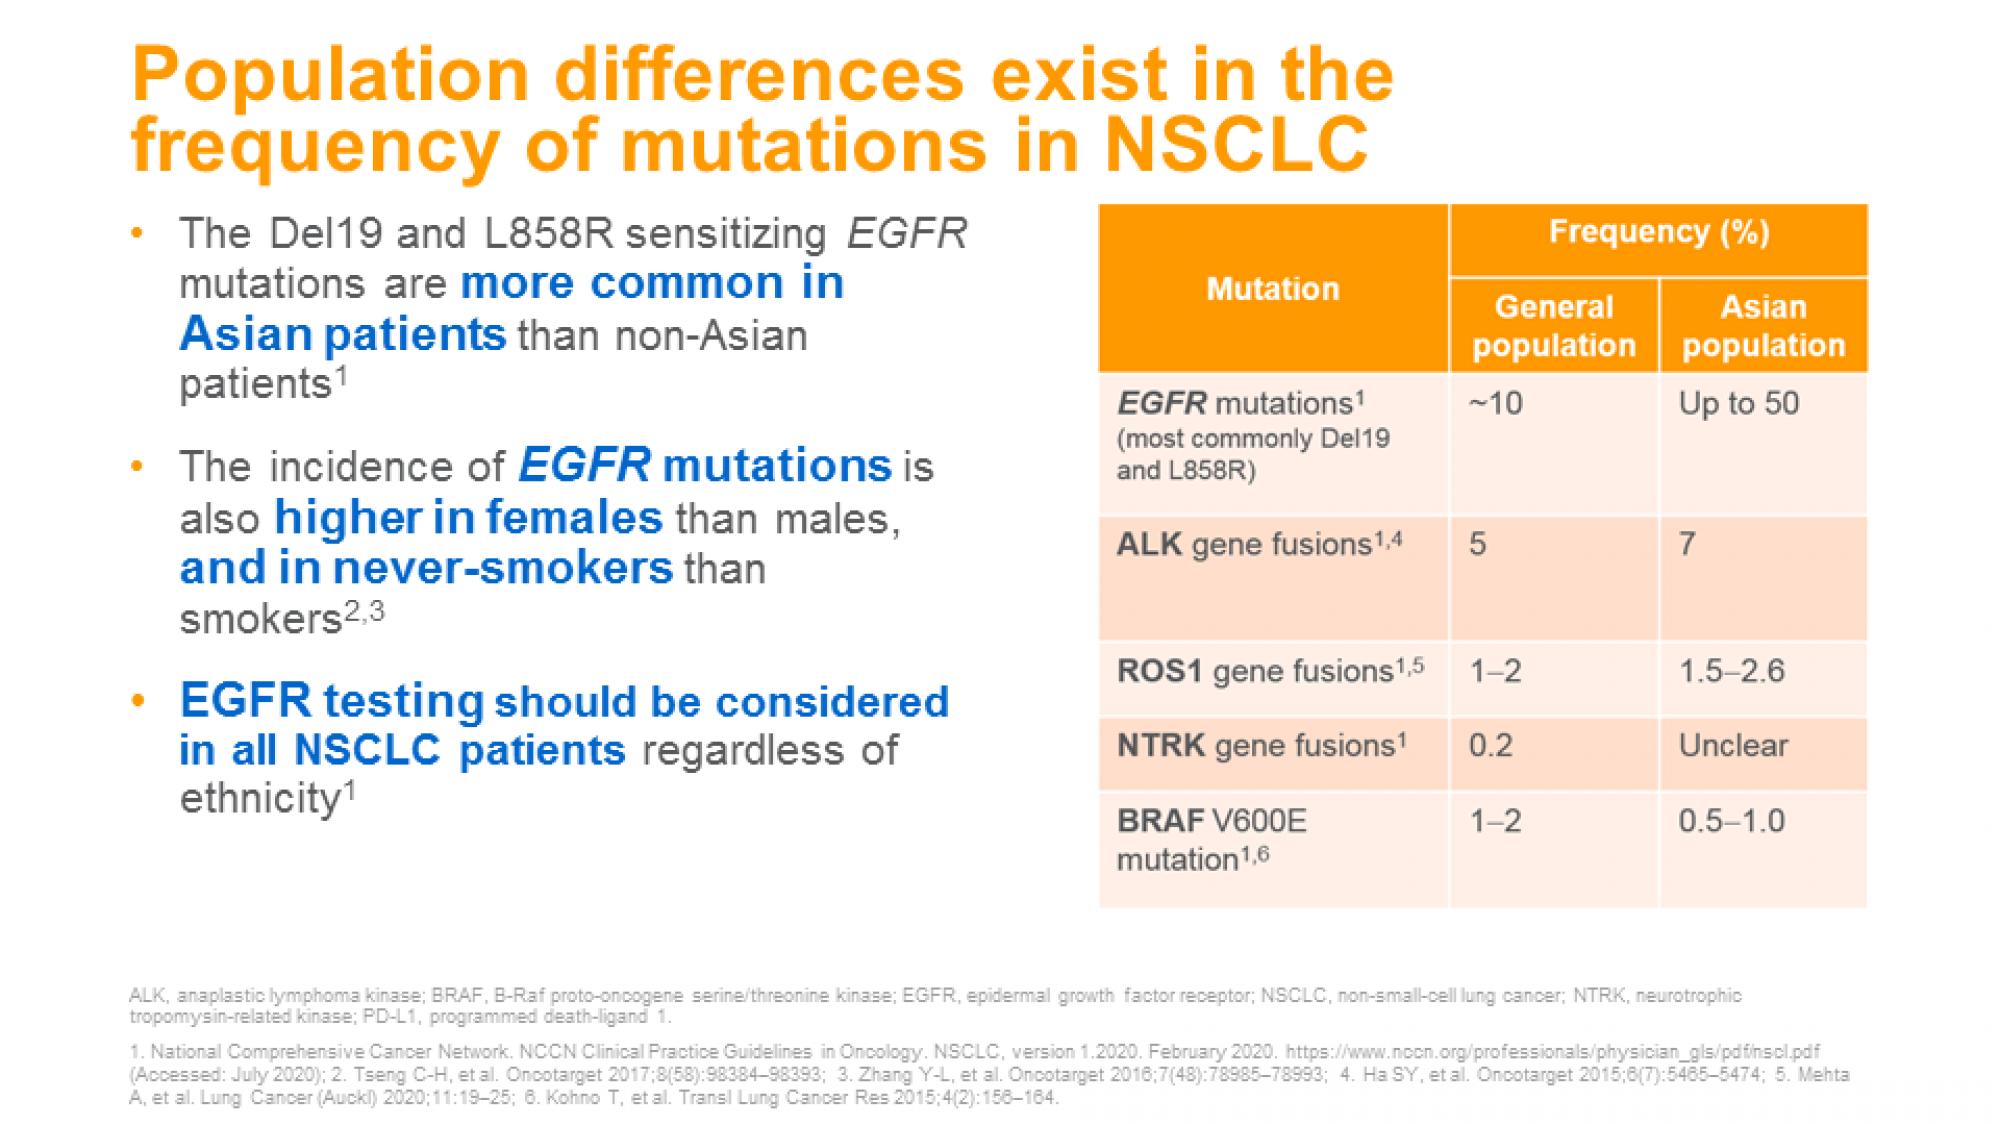 NSCLC ch2 slide 4